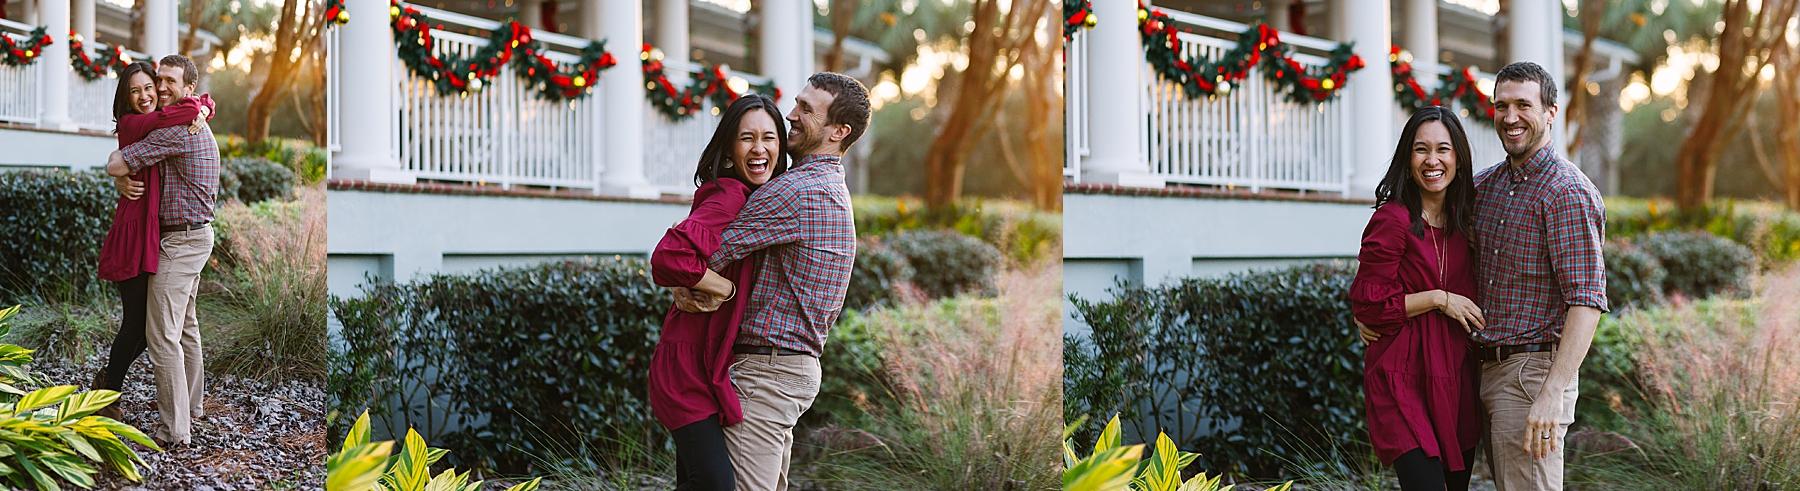 South Carolina Engagement Photographer